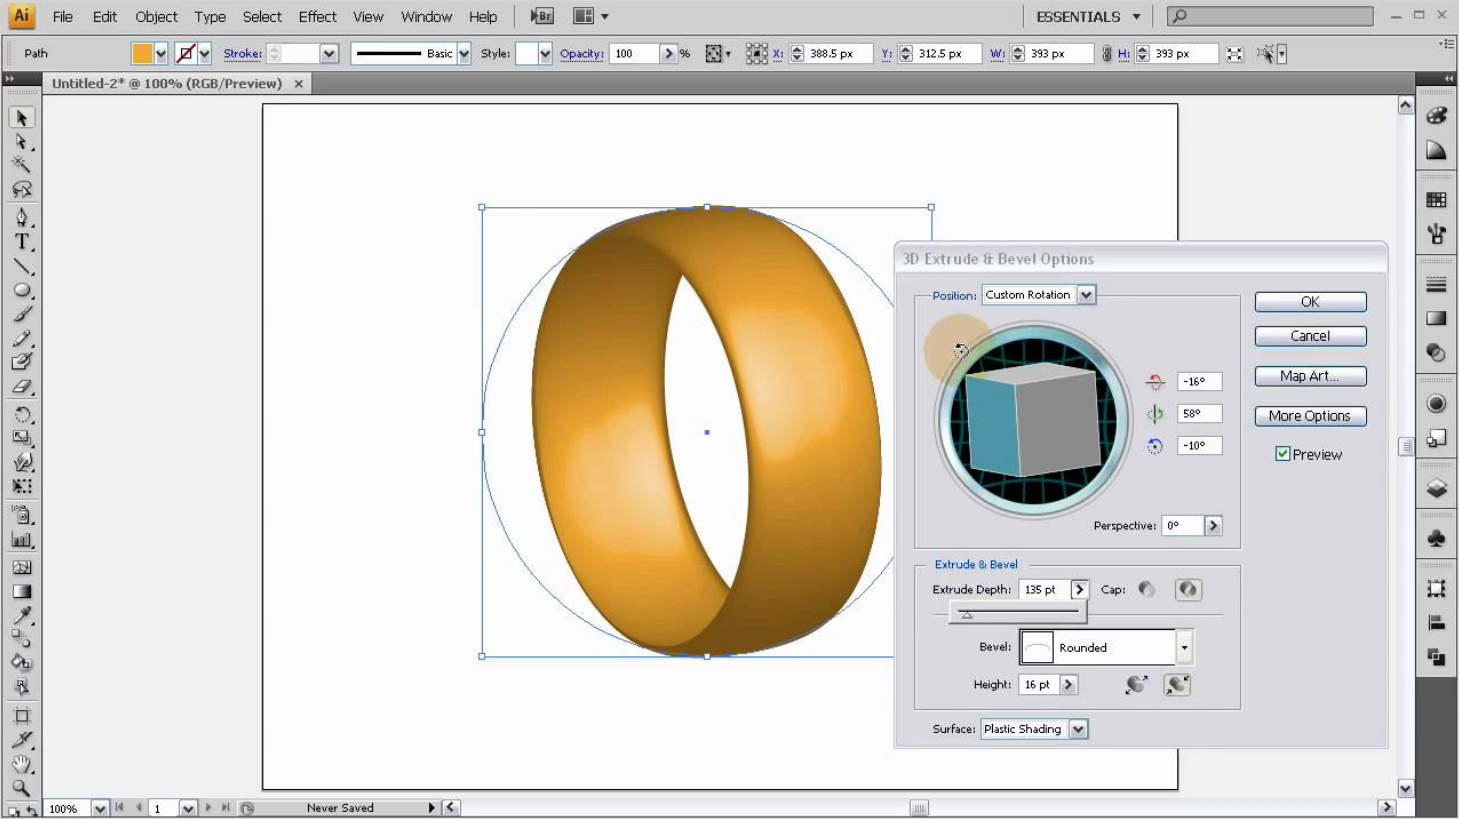 Adobe Illustrator CS4 Latest Version